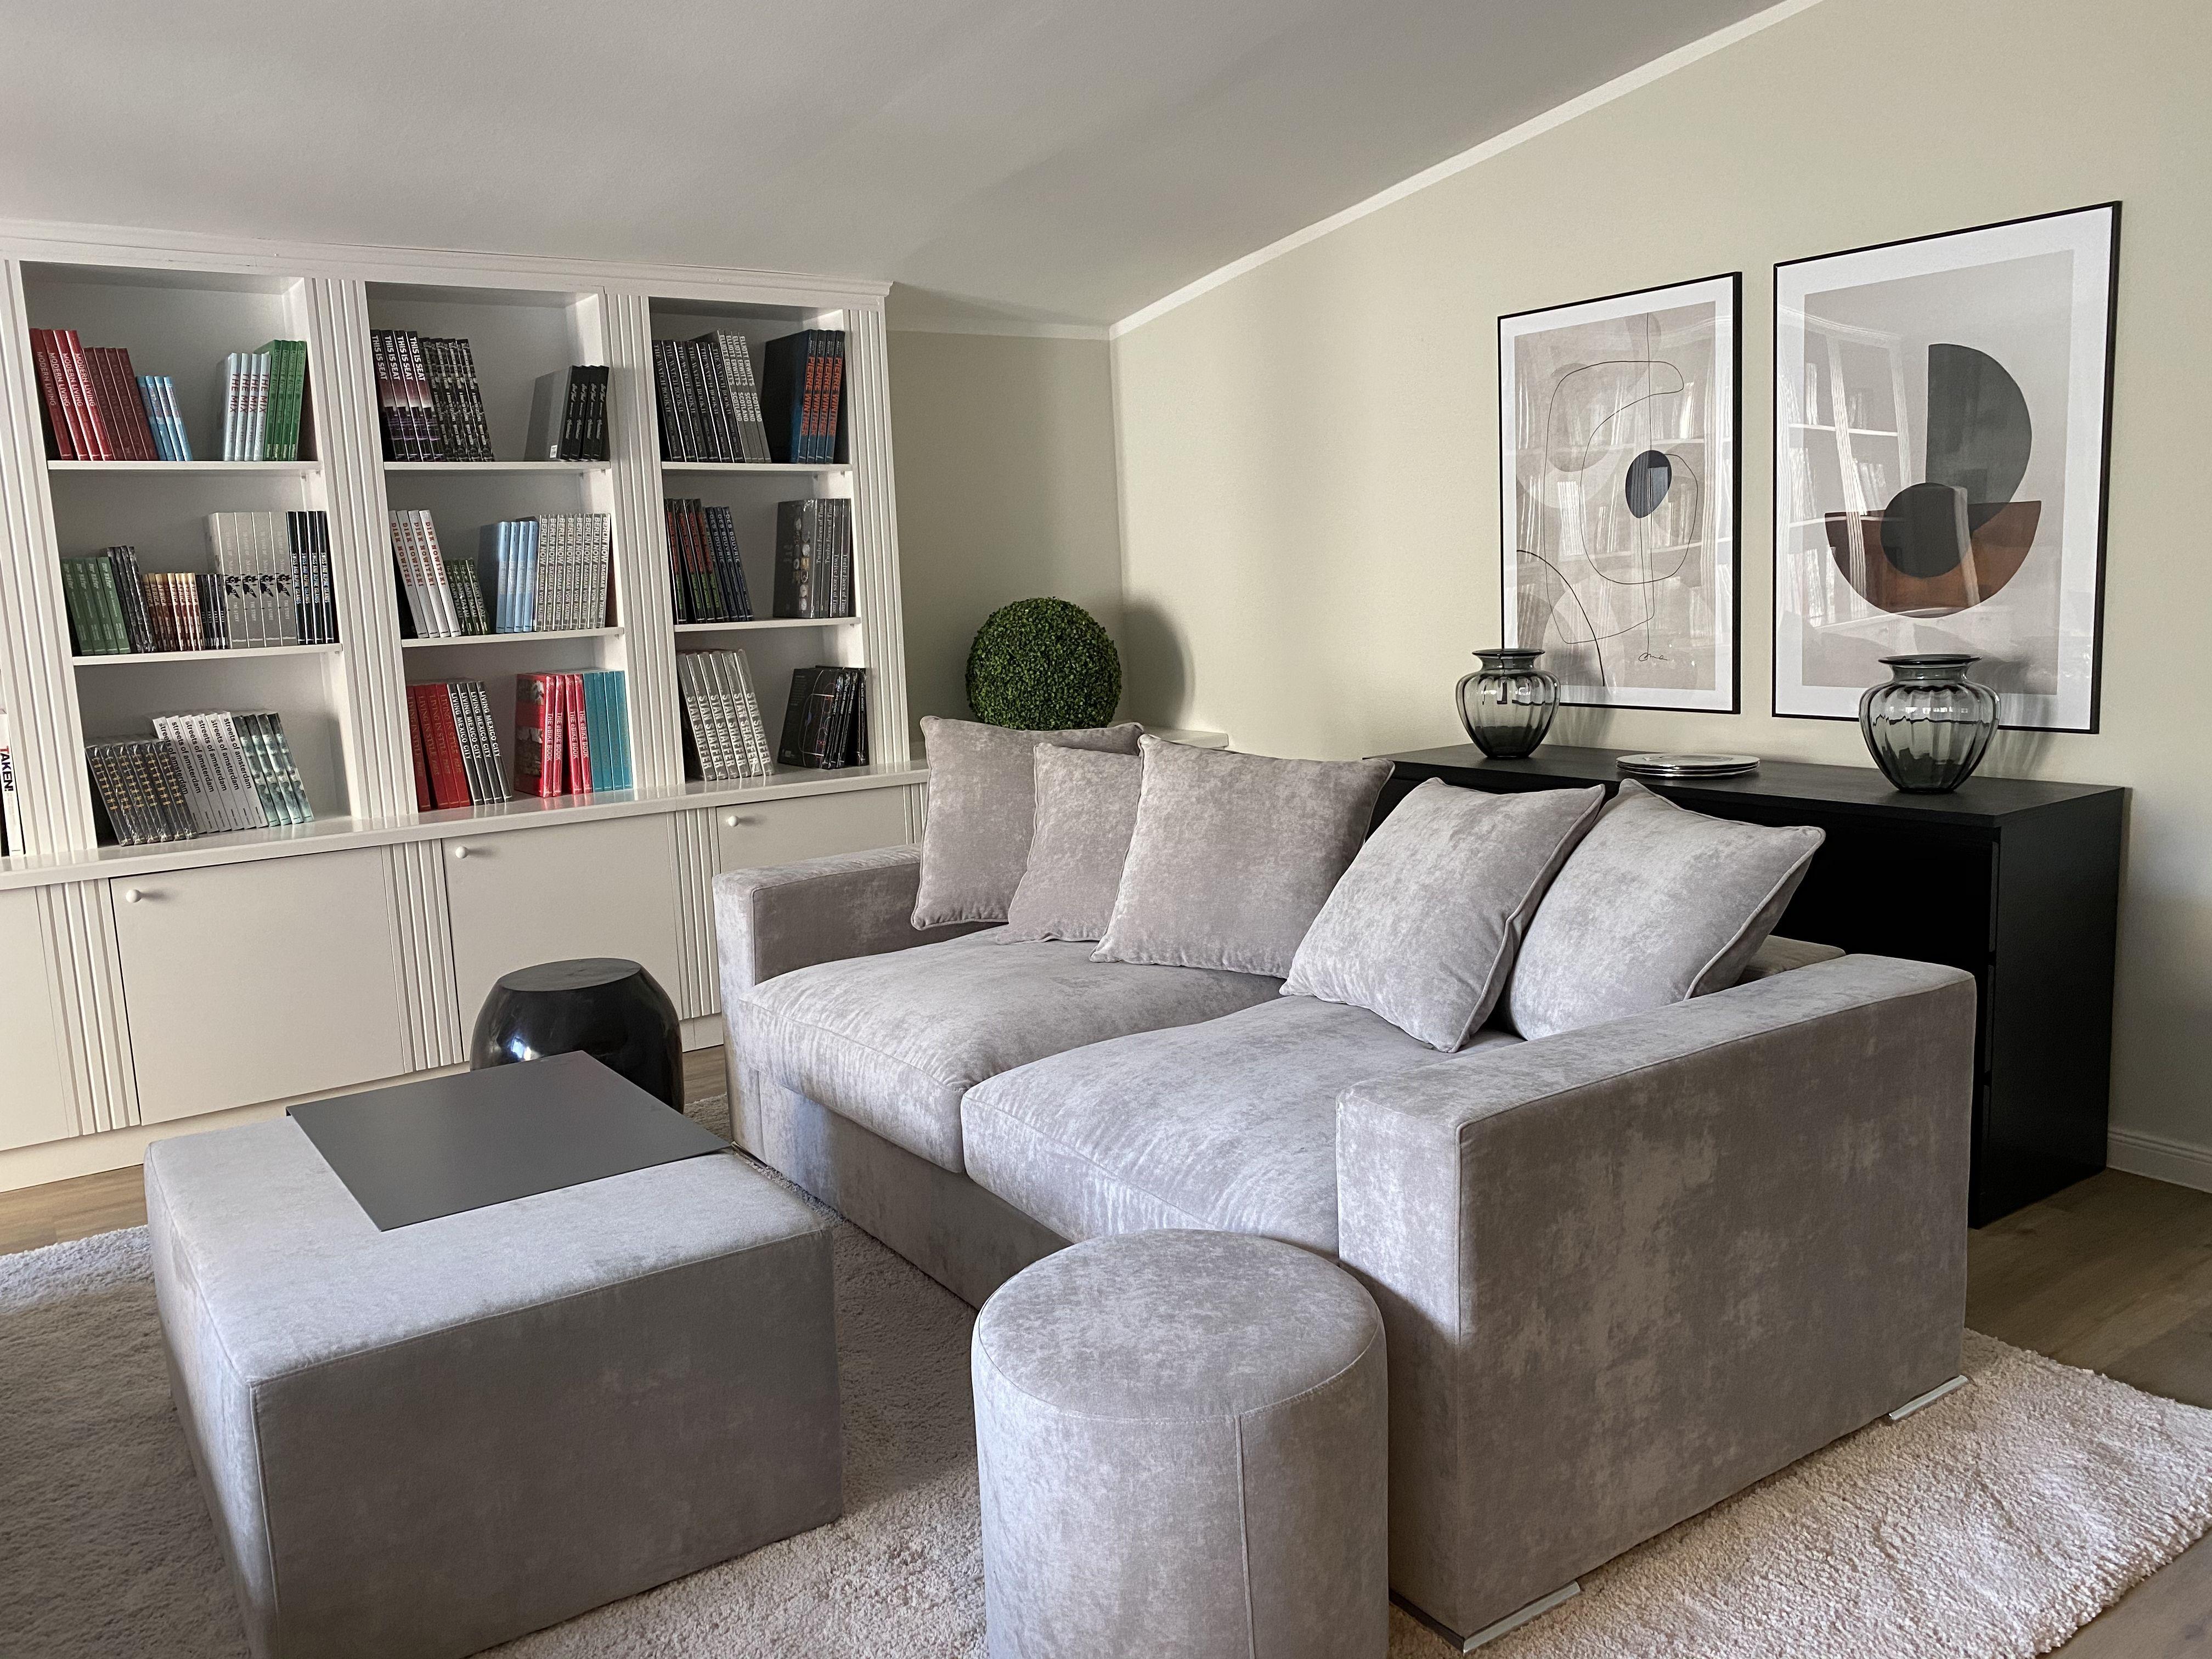 Samtsofa Cooper 3 Sitzer Grau In 2020 Samt Sofa Wohnen Sitzecke